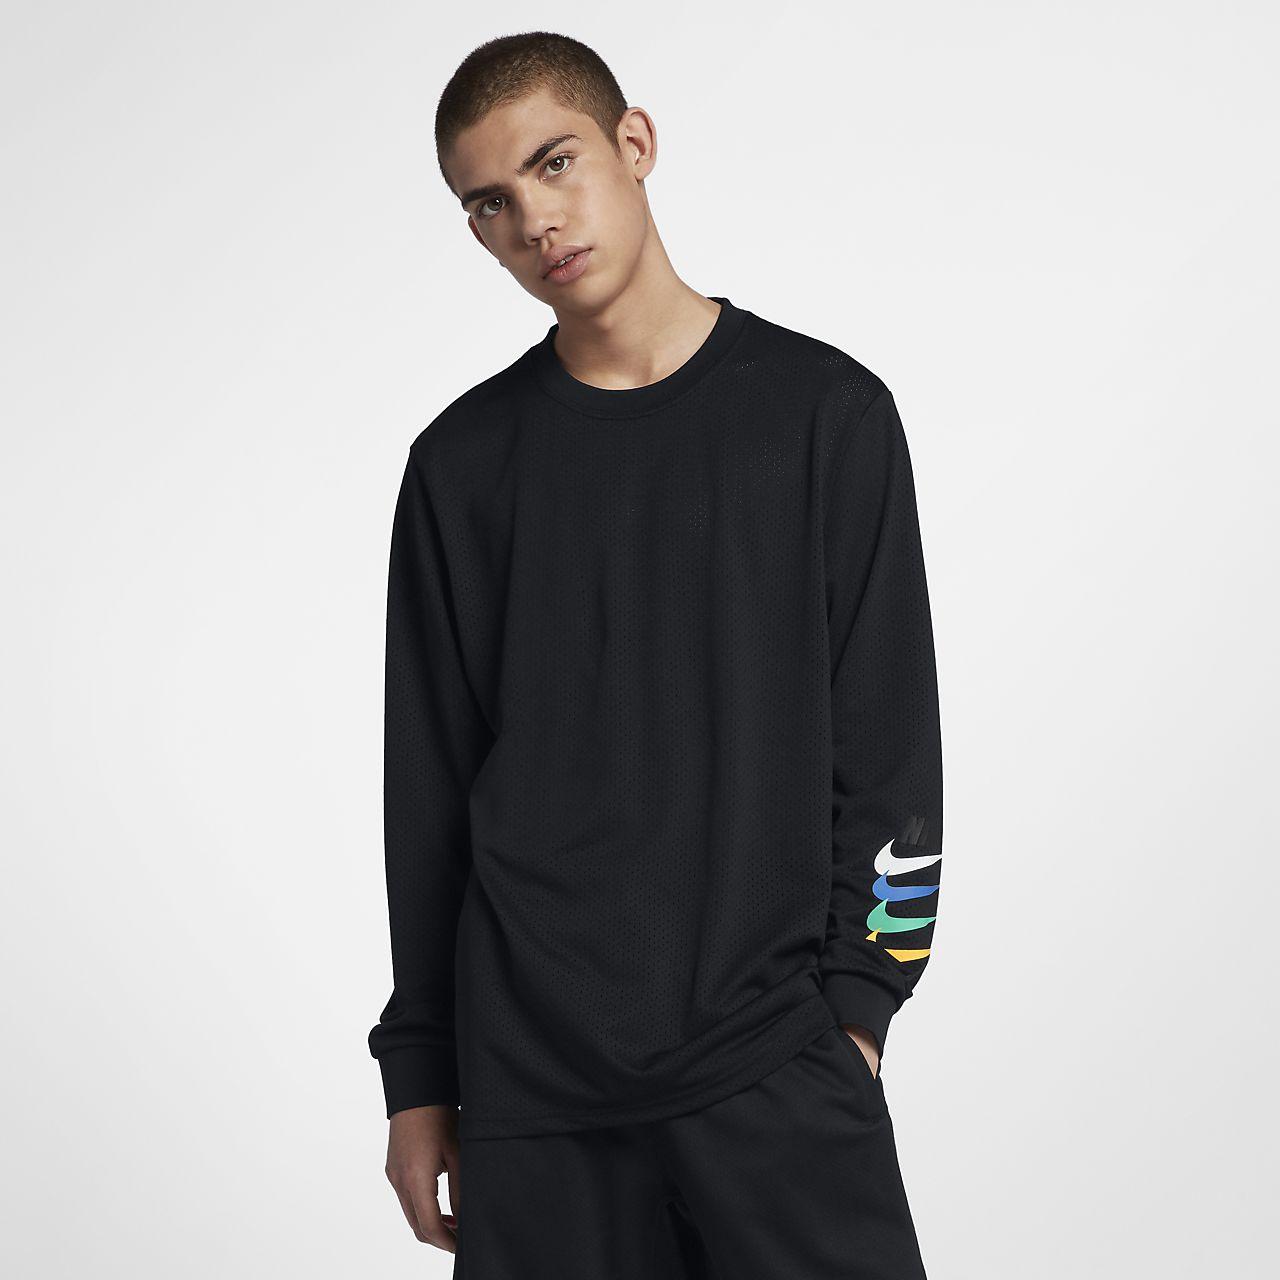 ... Nike SB Dri-FIT Men's Long Sleeve Top